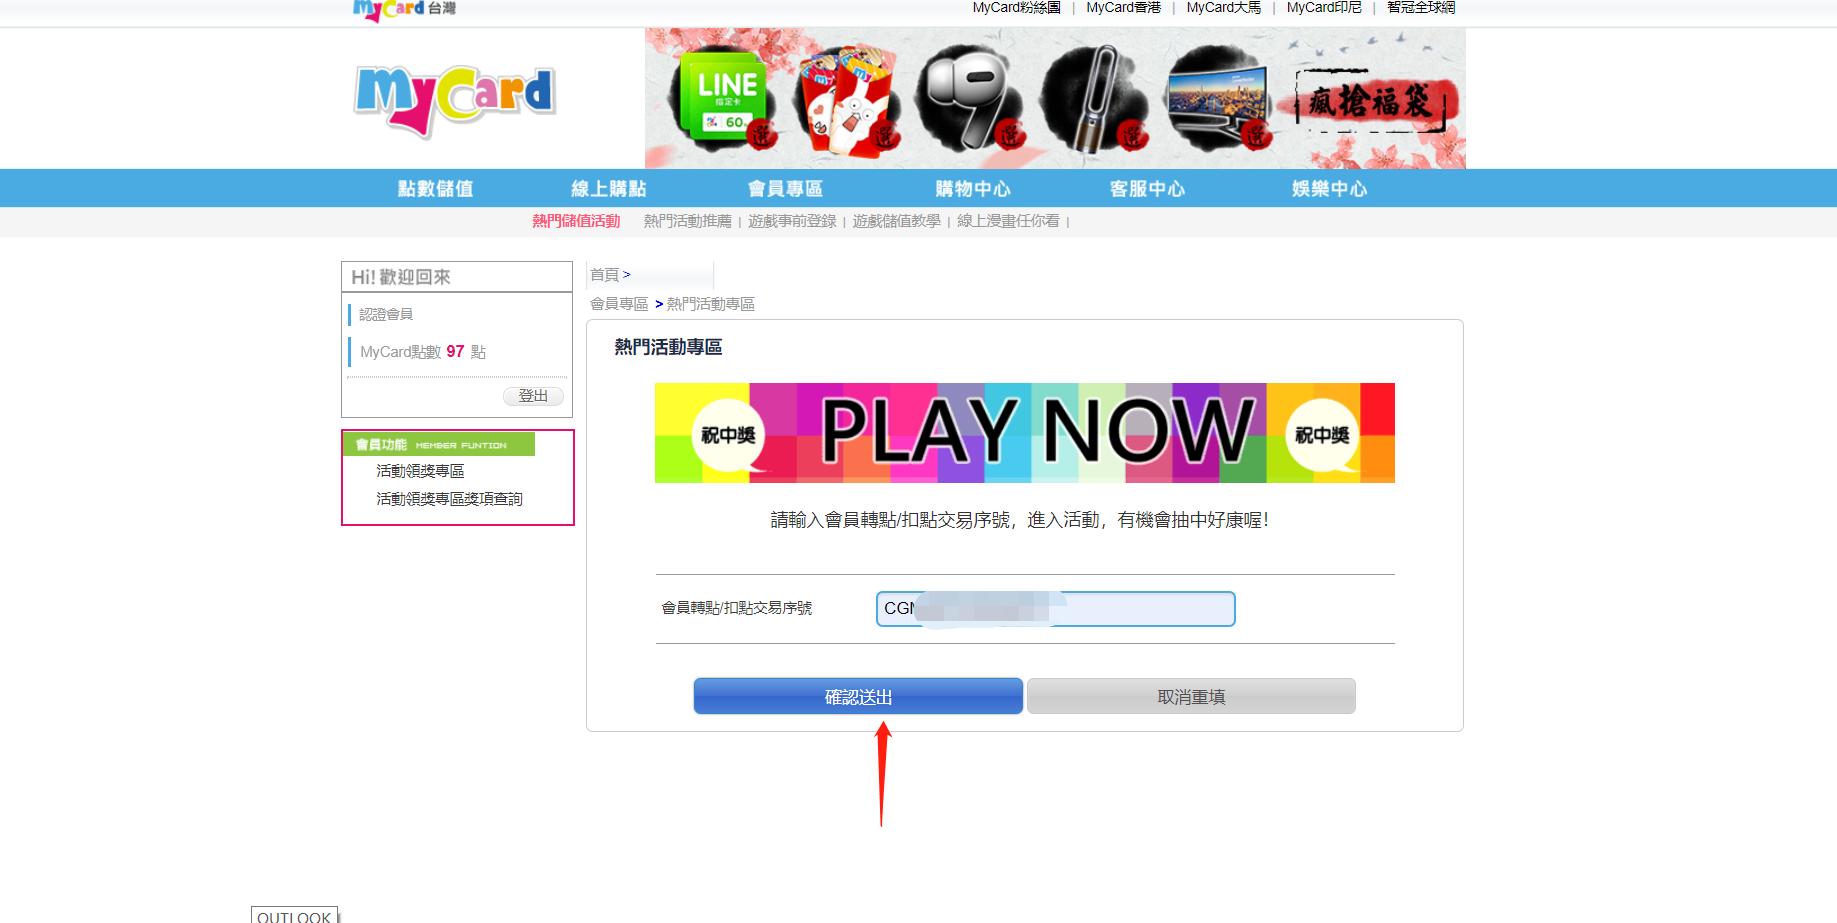 Mycard储值活动详细流程指南-确认退出.png